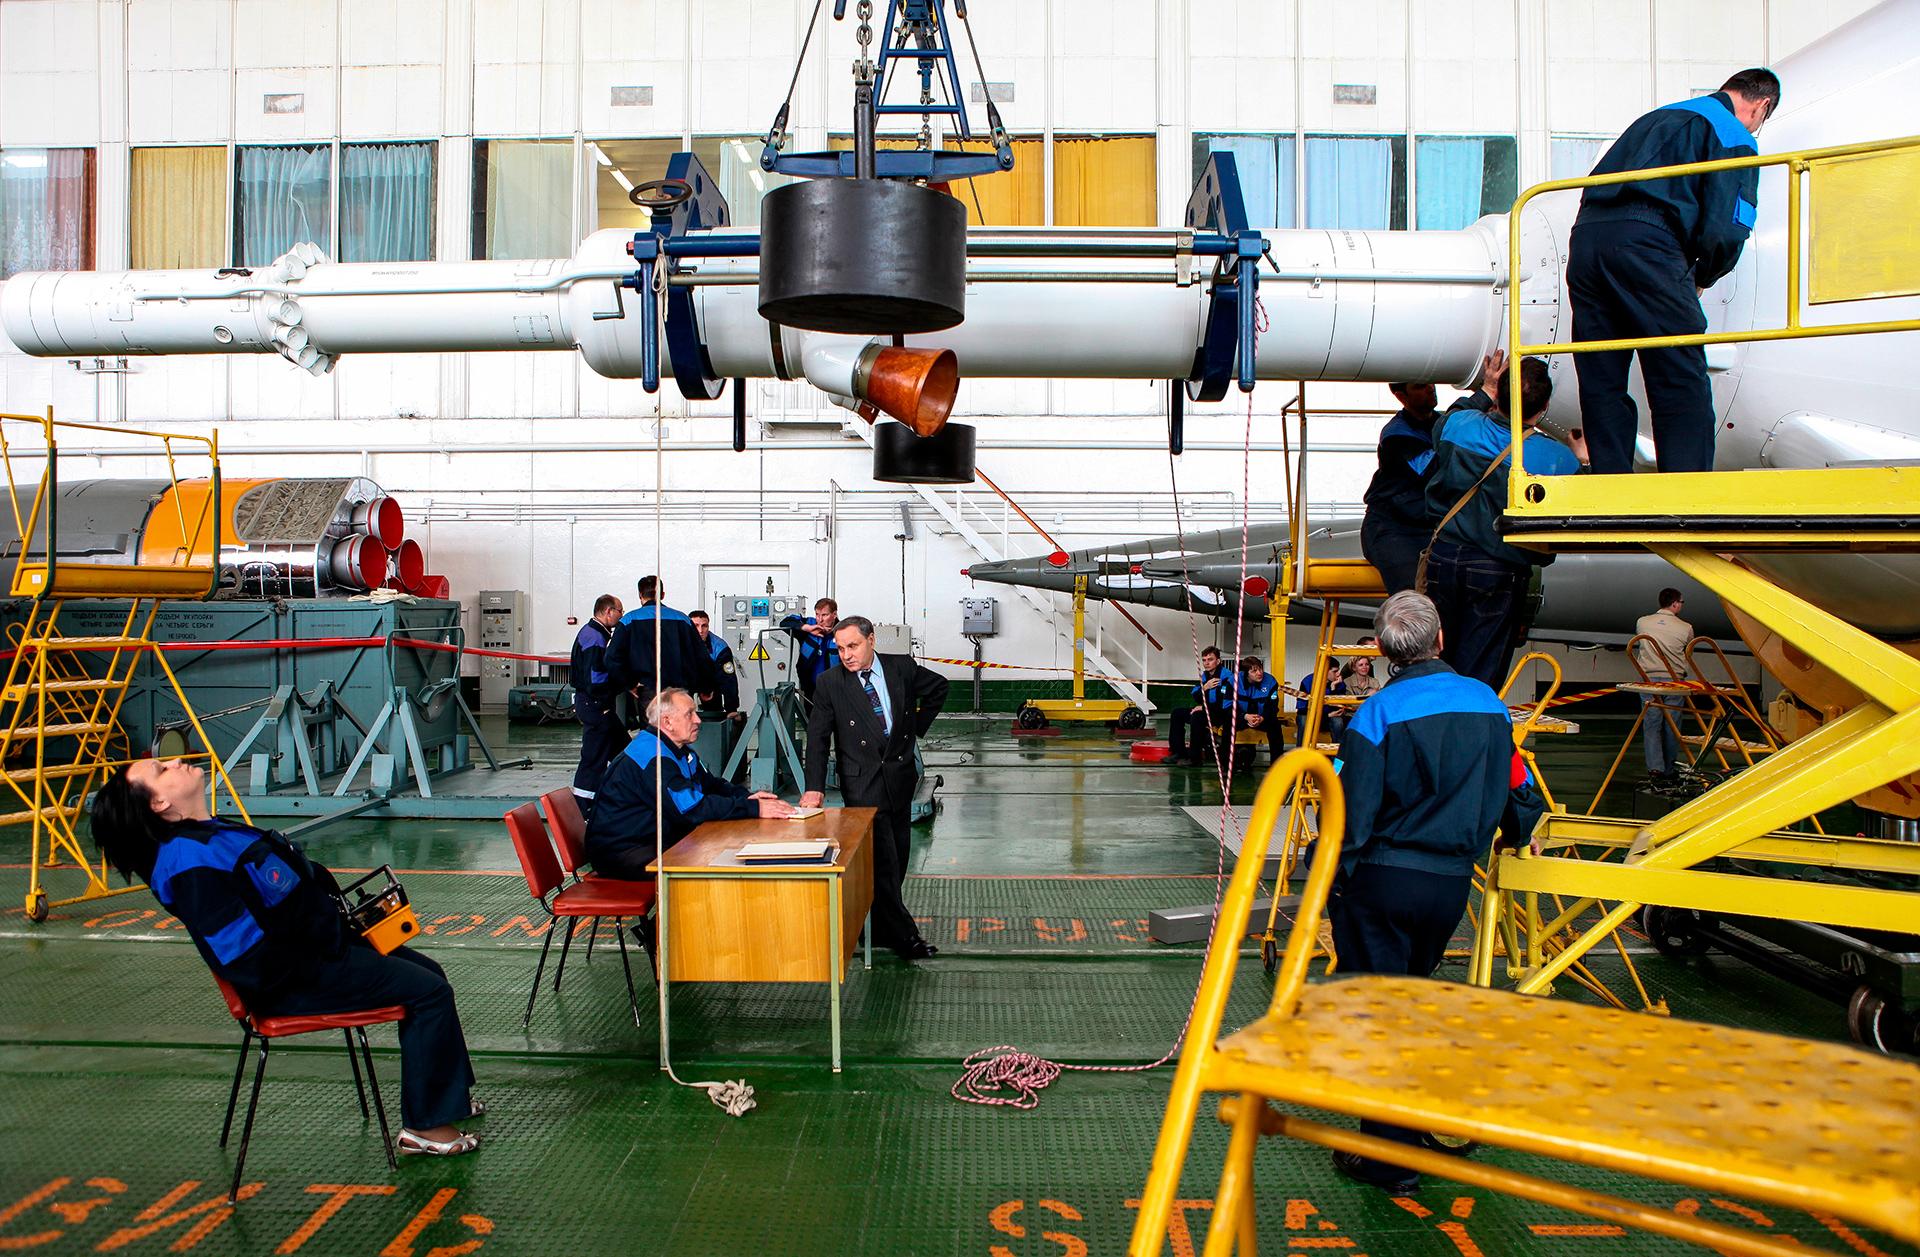 Soiuz rocket launching, Baikonur 2010, Kazakhstan, ракета, Союз, институт Энергия